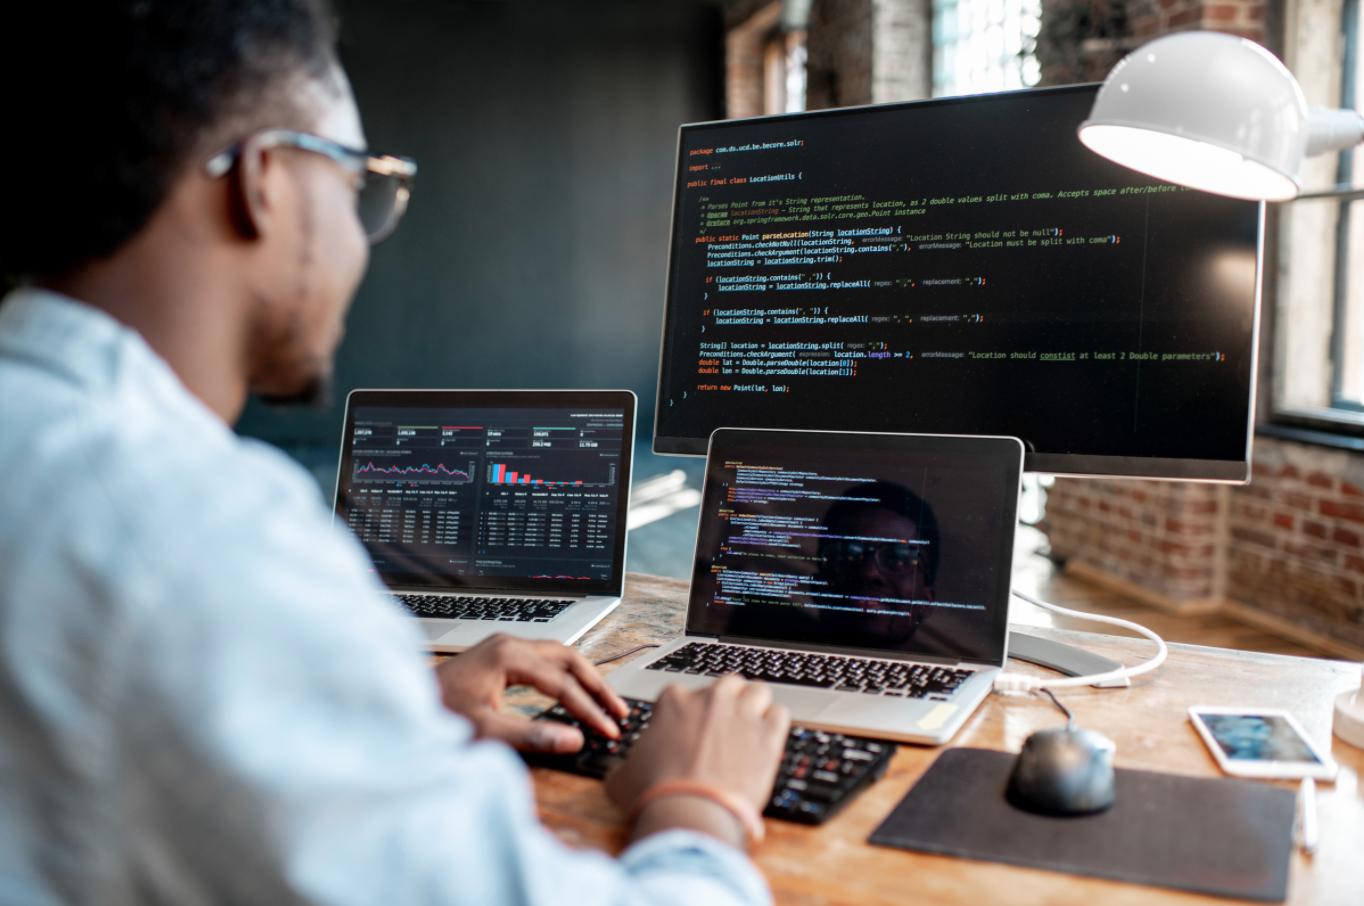 man coding on 3 different monitors